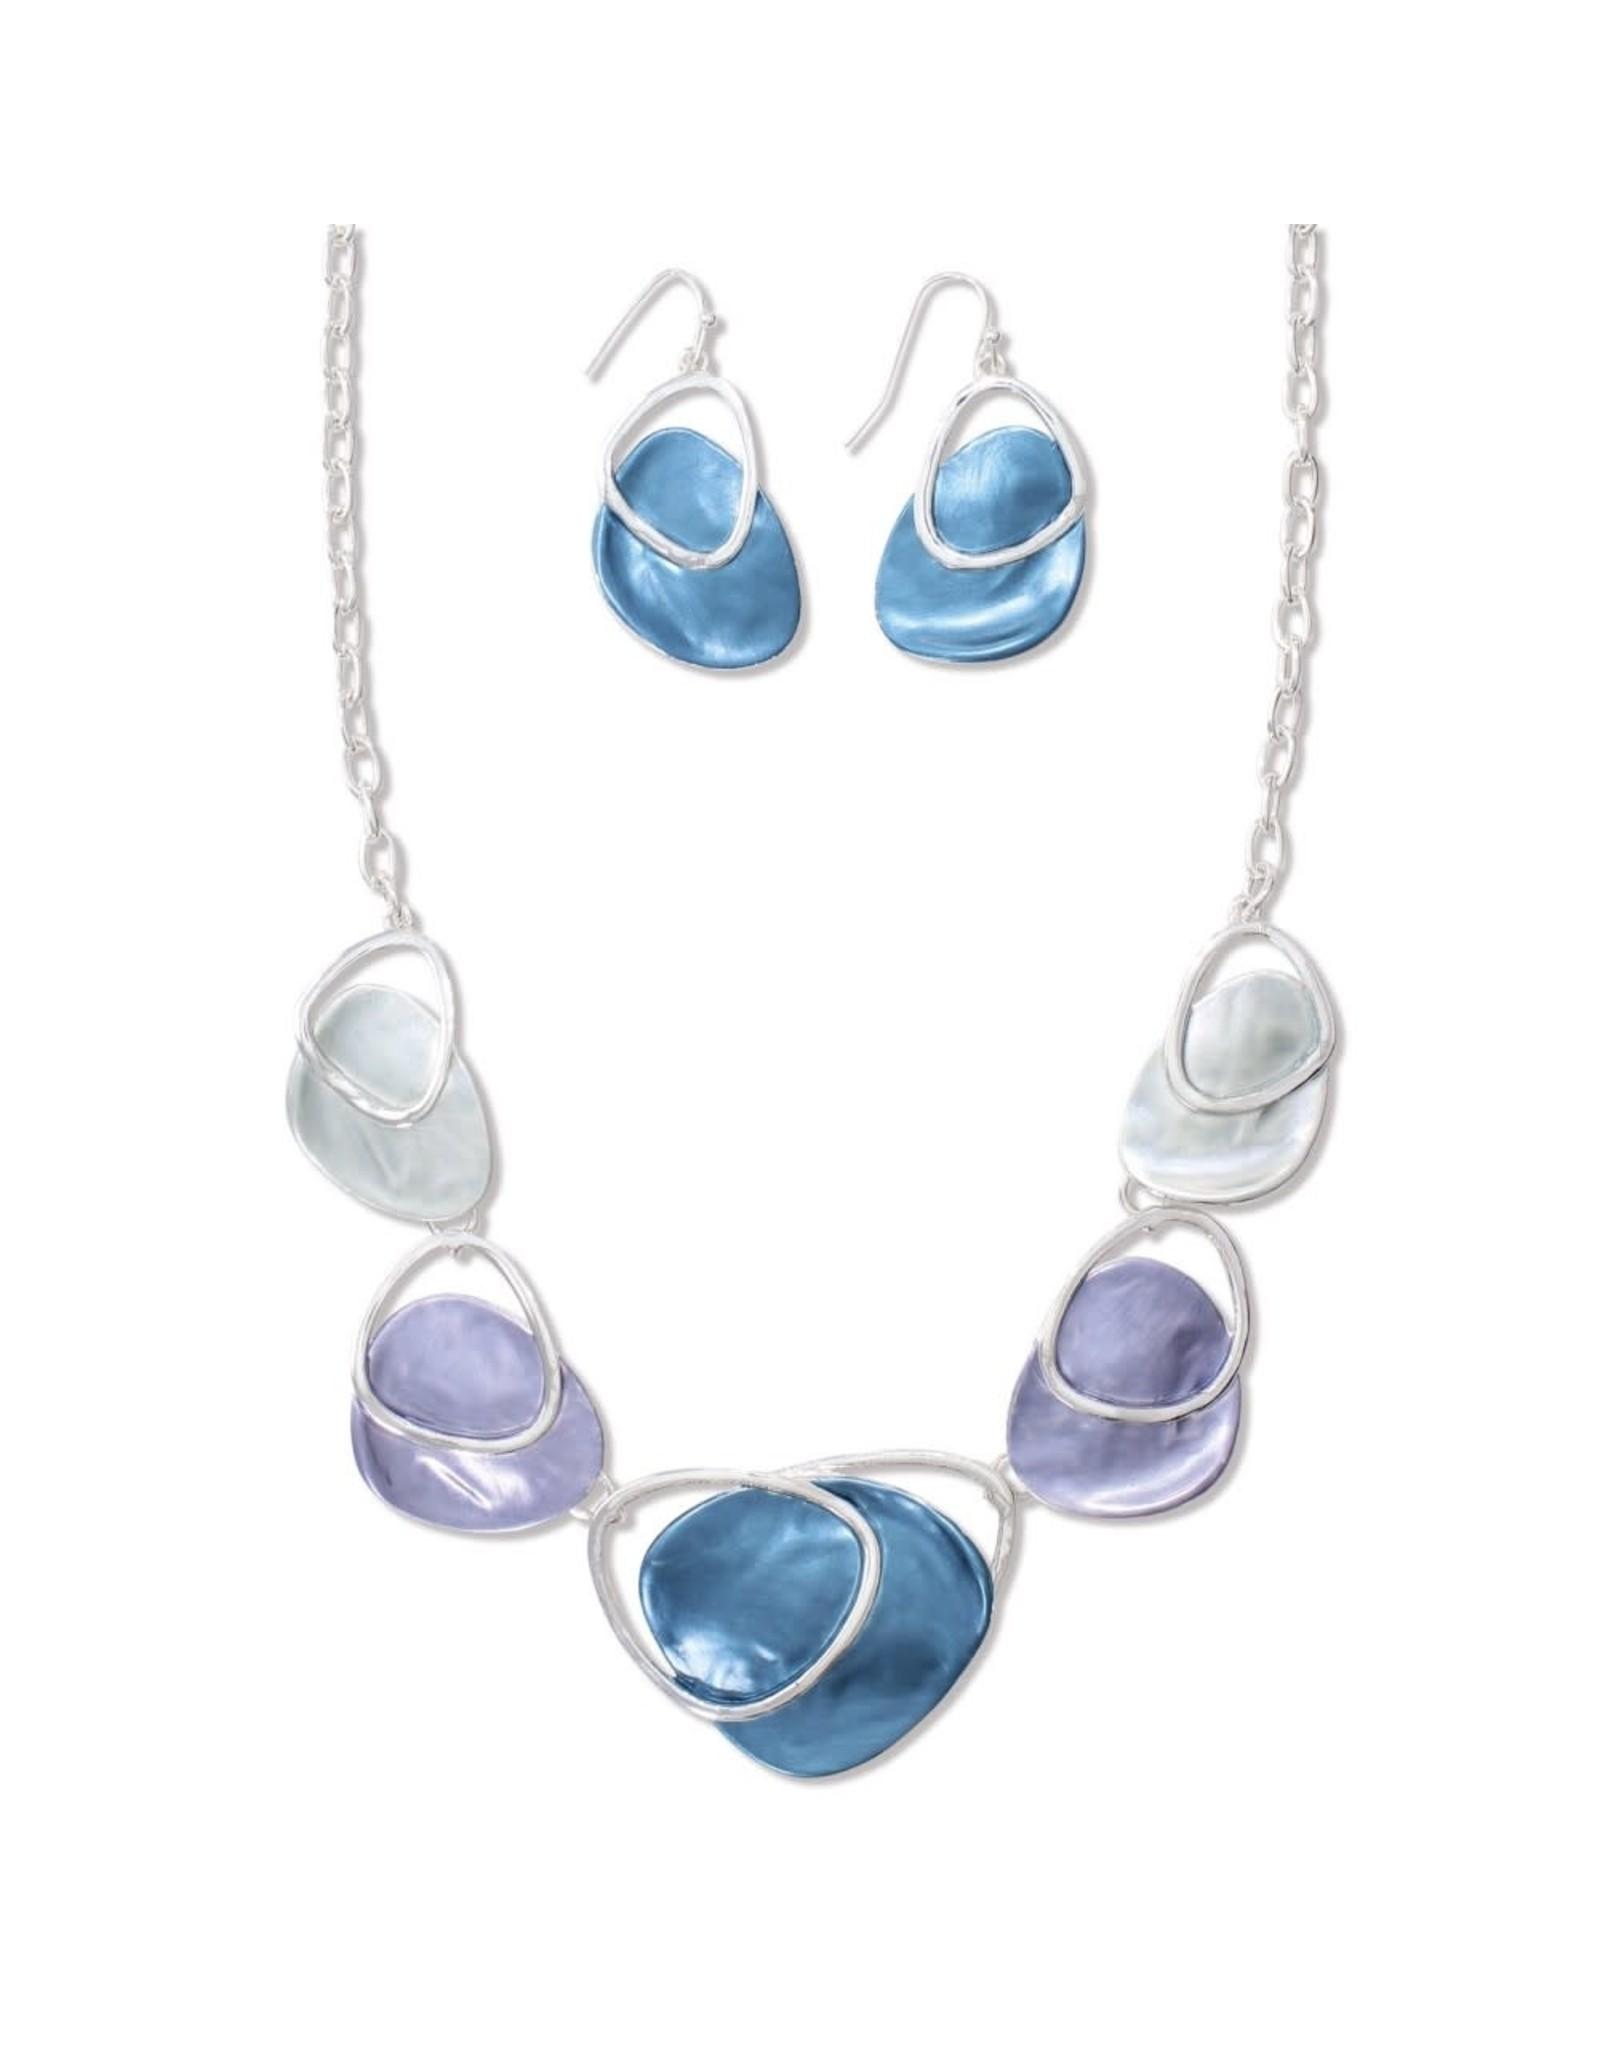 Periwinkle by Barlow 18 Inch Cool Blue Purple Teal Enamel Necklace Set